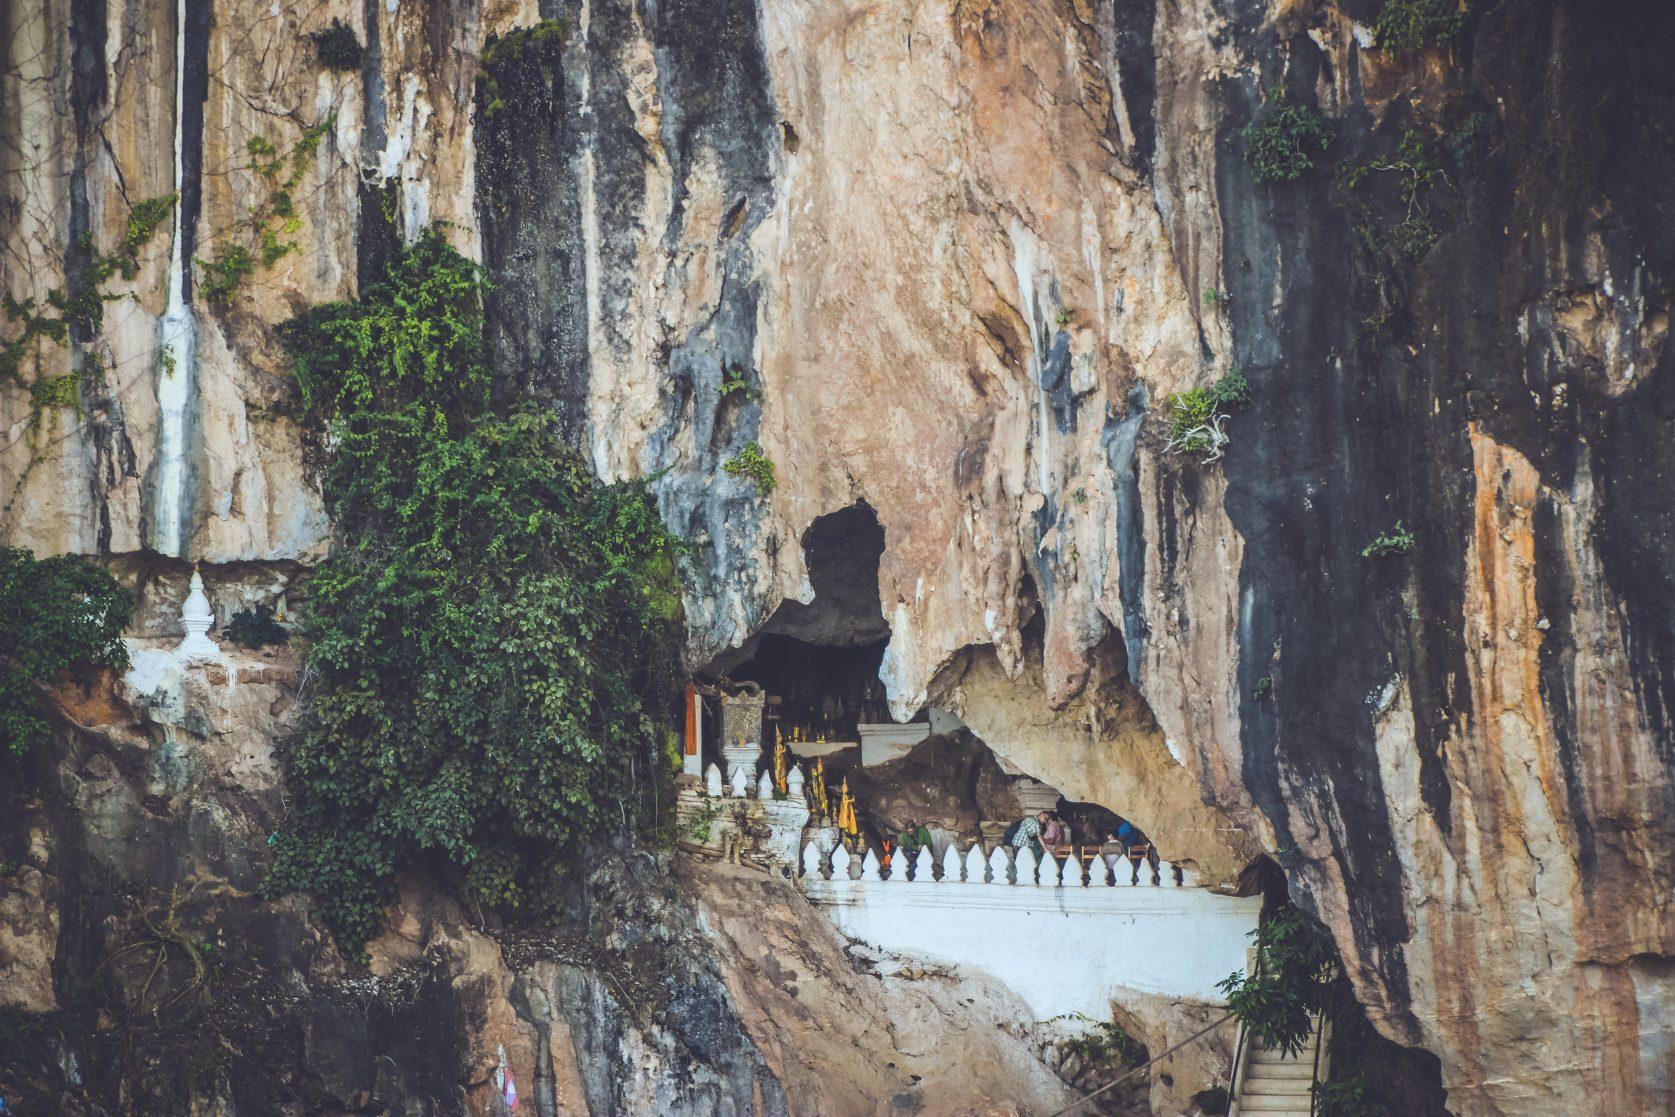 Cave luang prabang